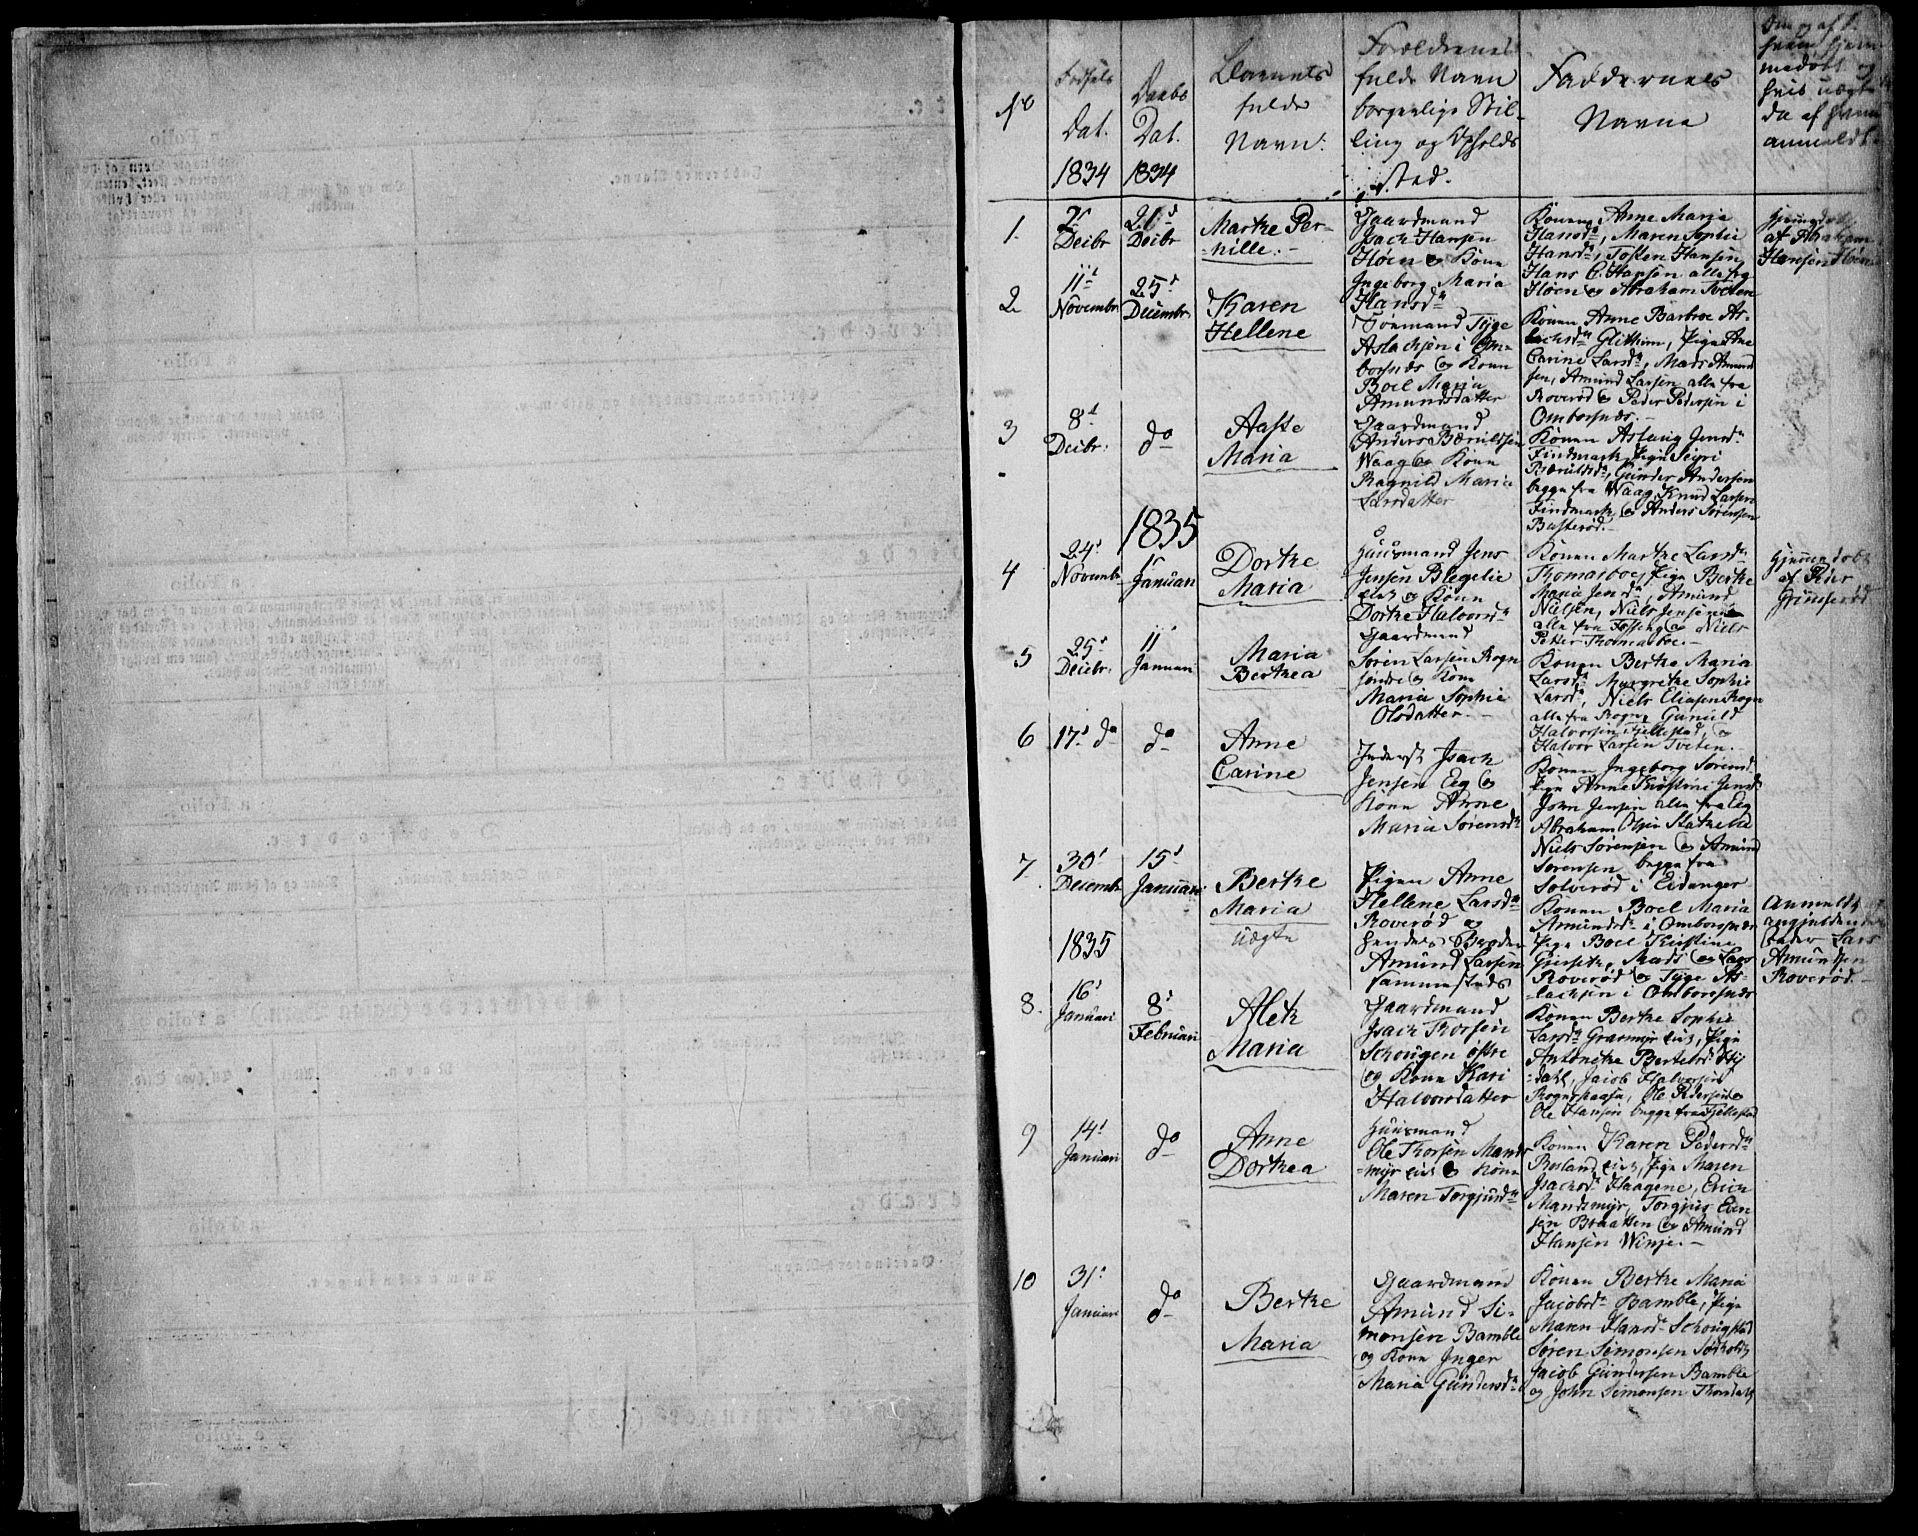 SAKO, Bamble kirkebøker, F/Fa/L0004: Ministerialbok nr. I 4, 1834-1853, s. 0-1